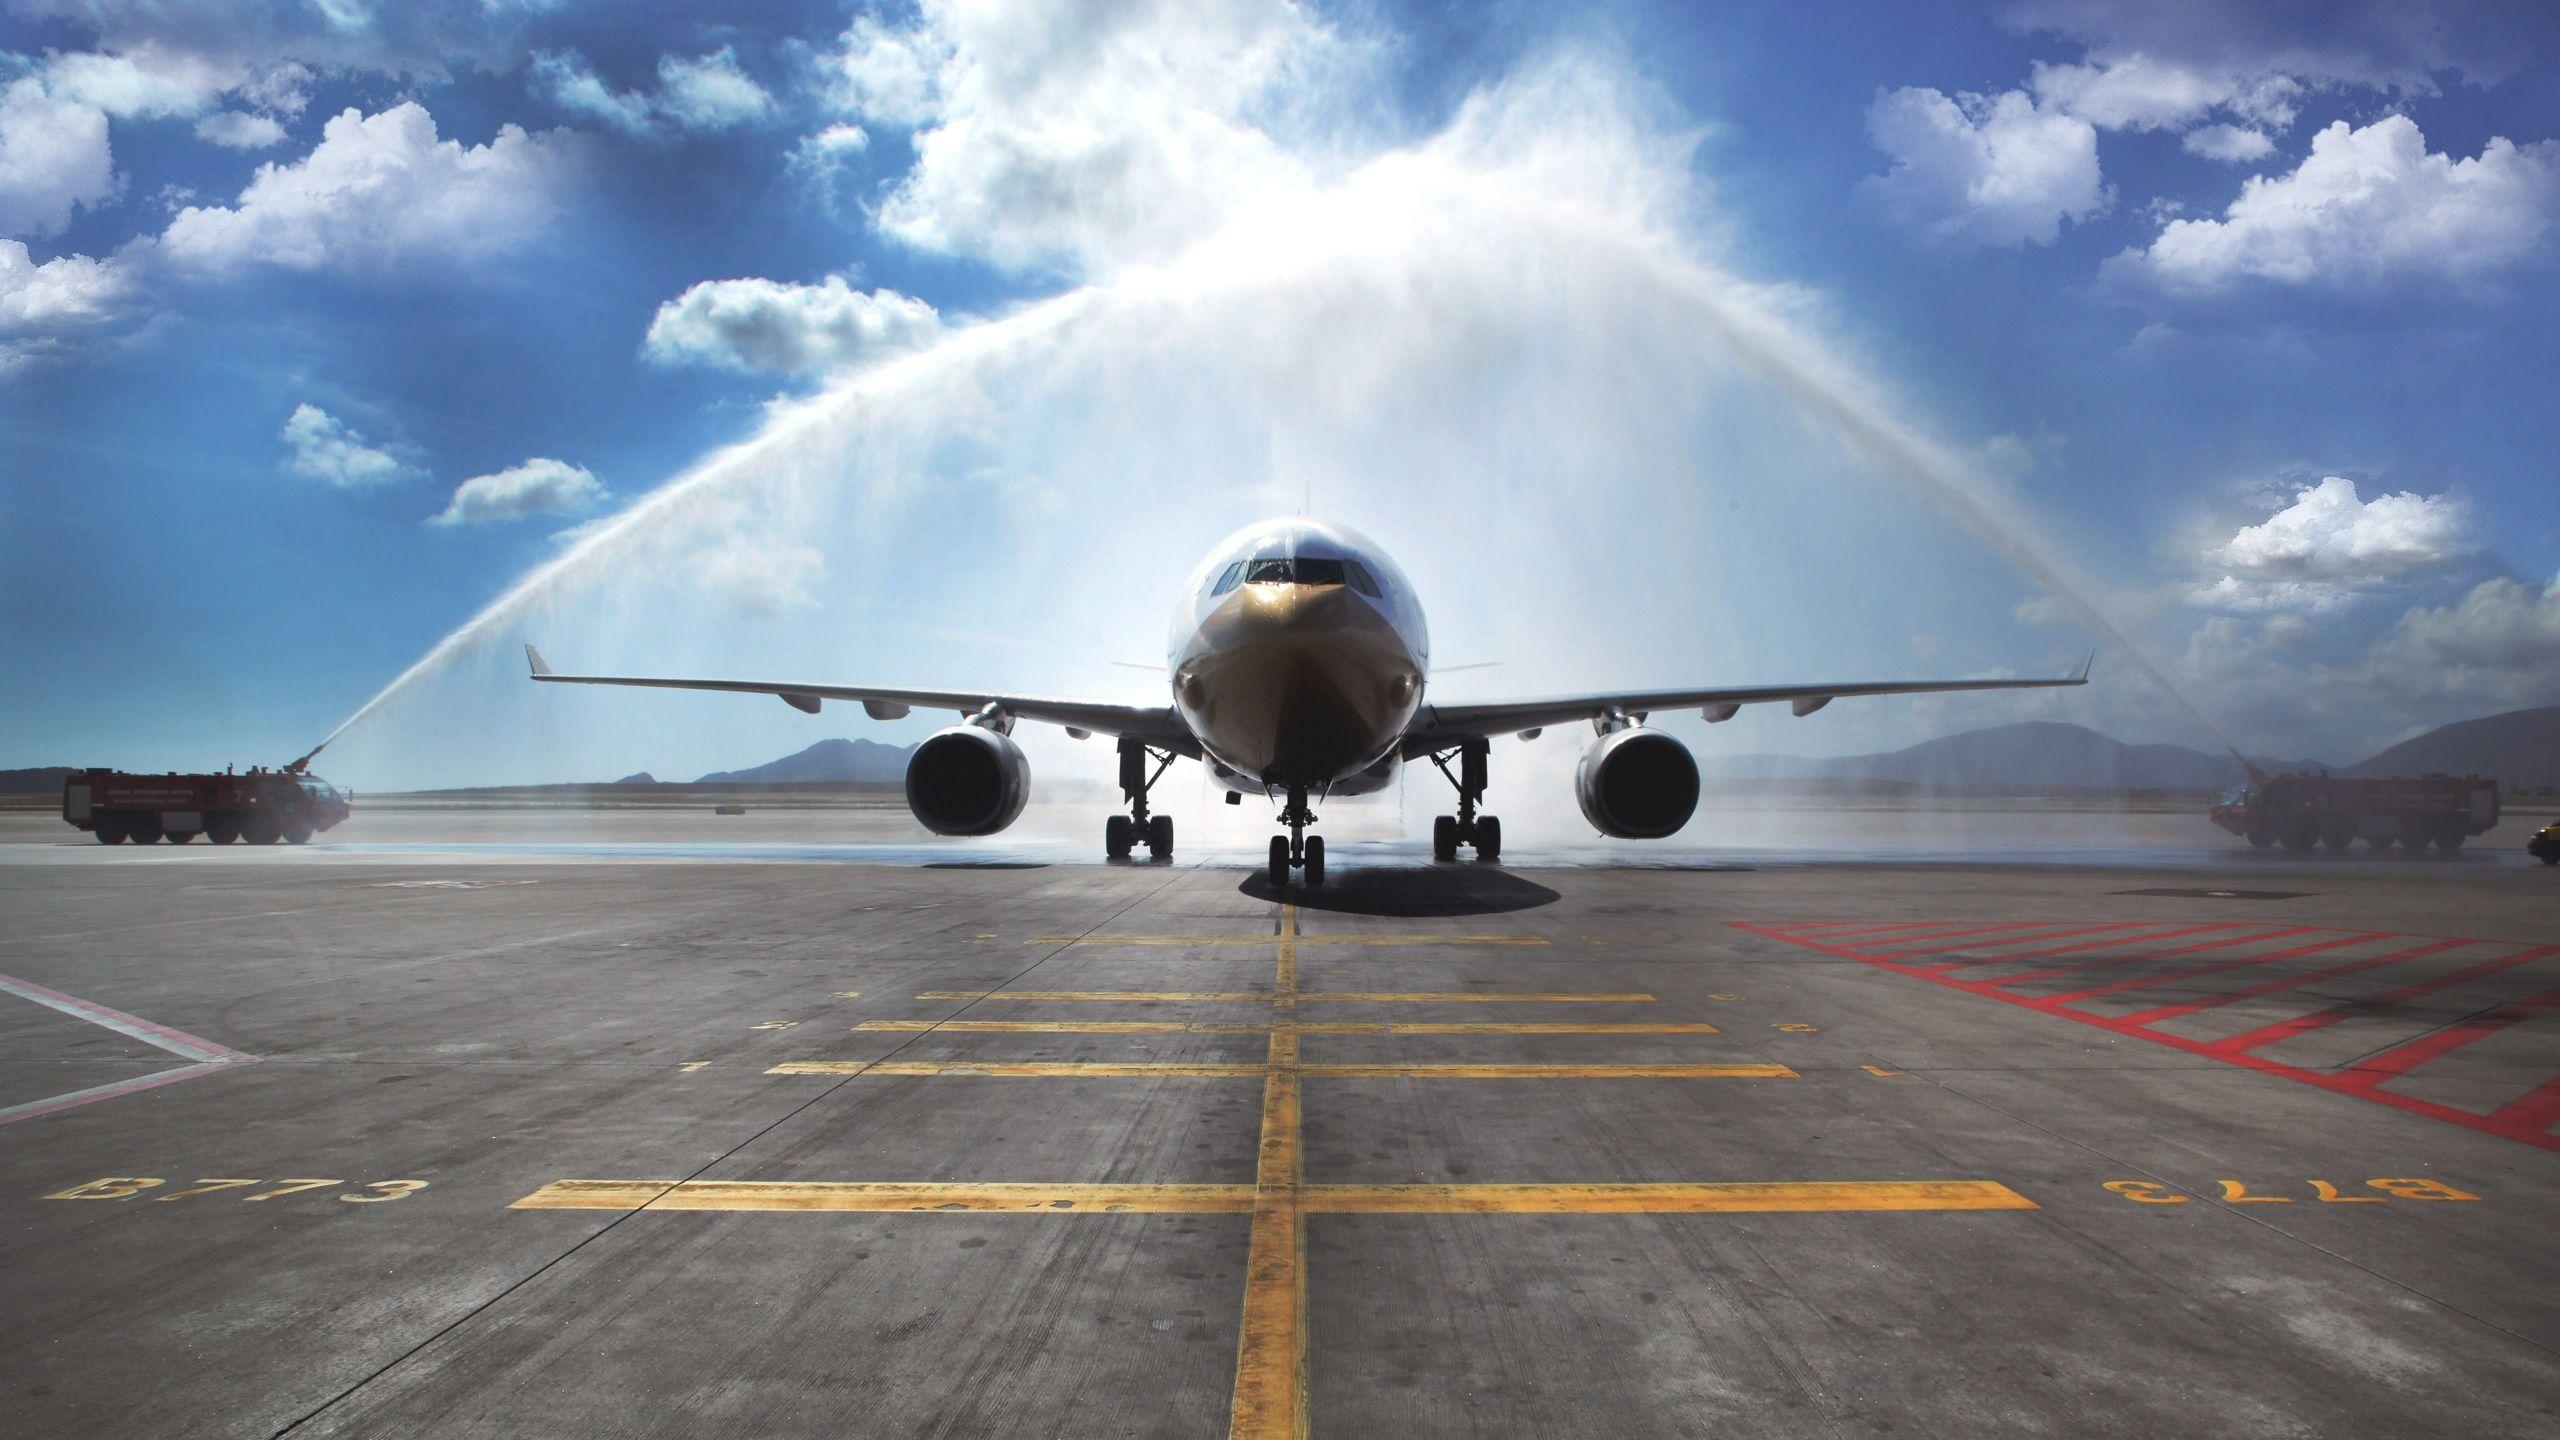 bangalore international airport images